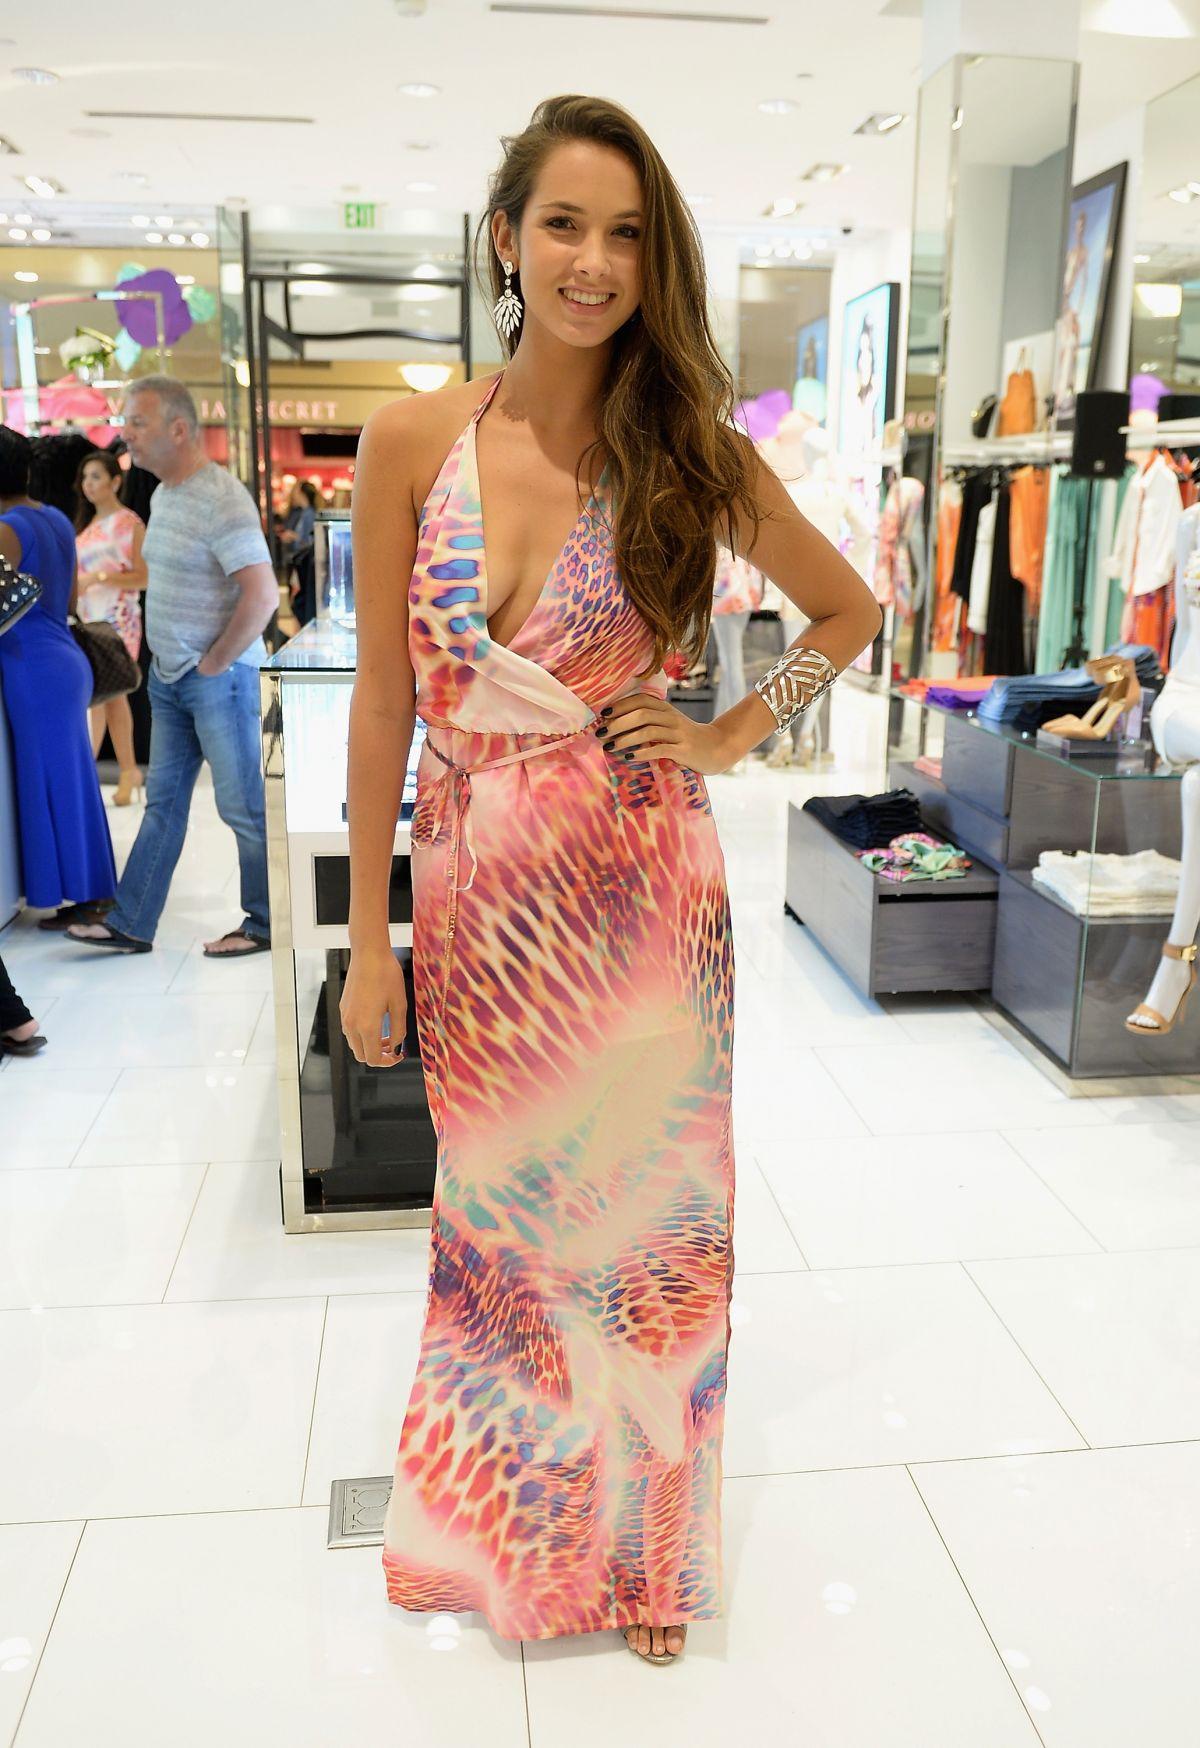 ROMANE RECALDE at Marciano Aventura Celebrates Dress Month